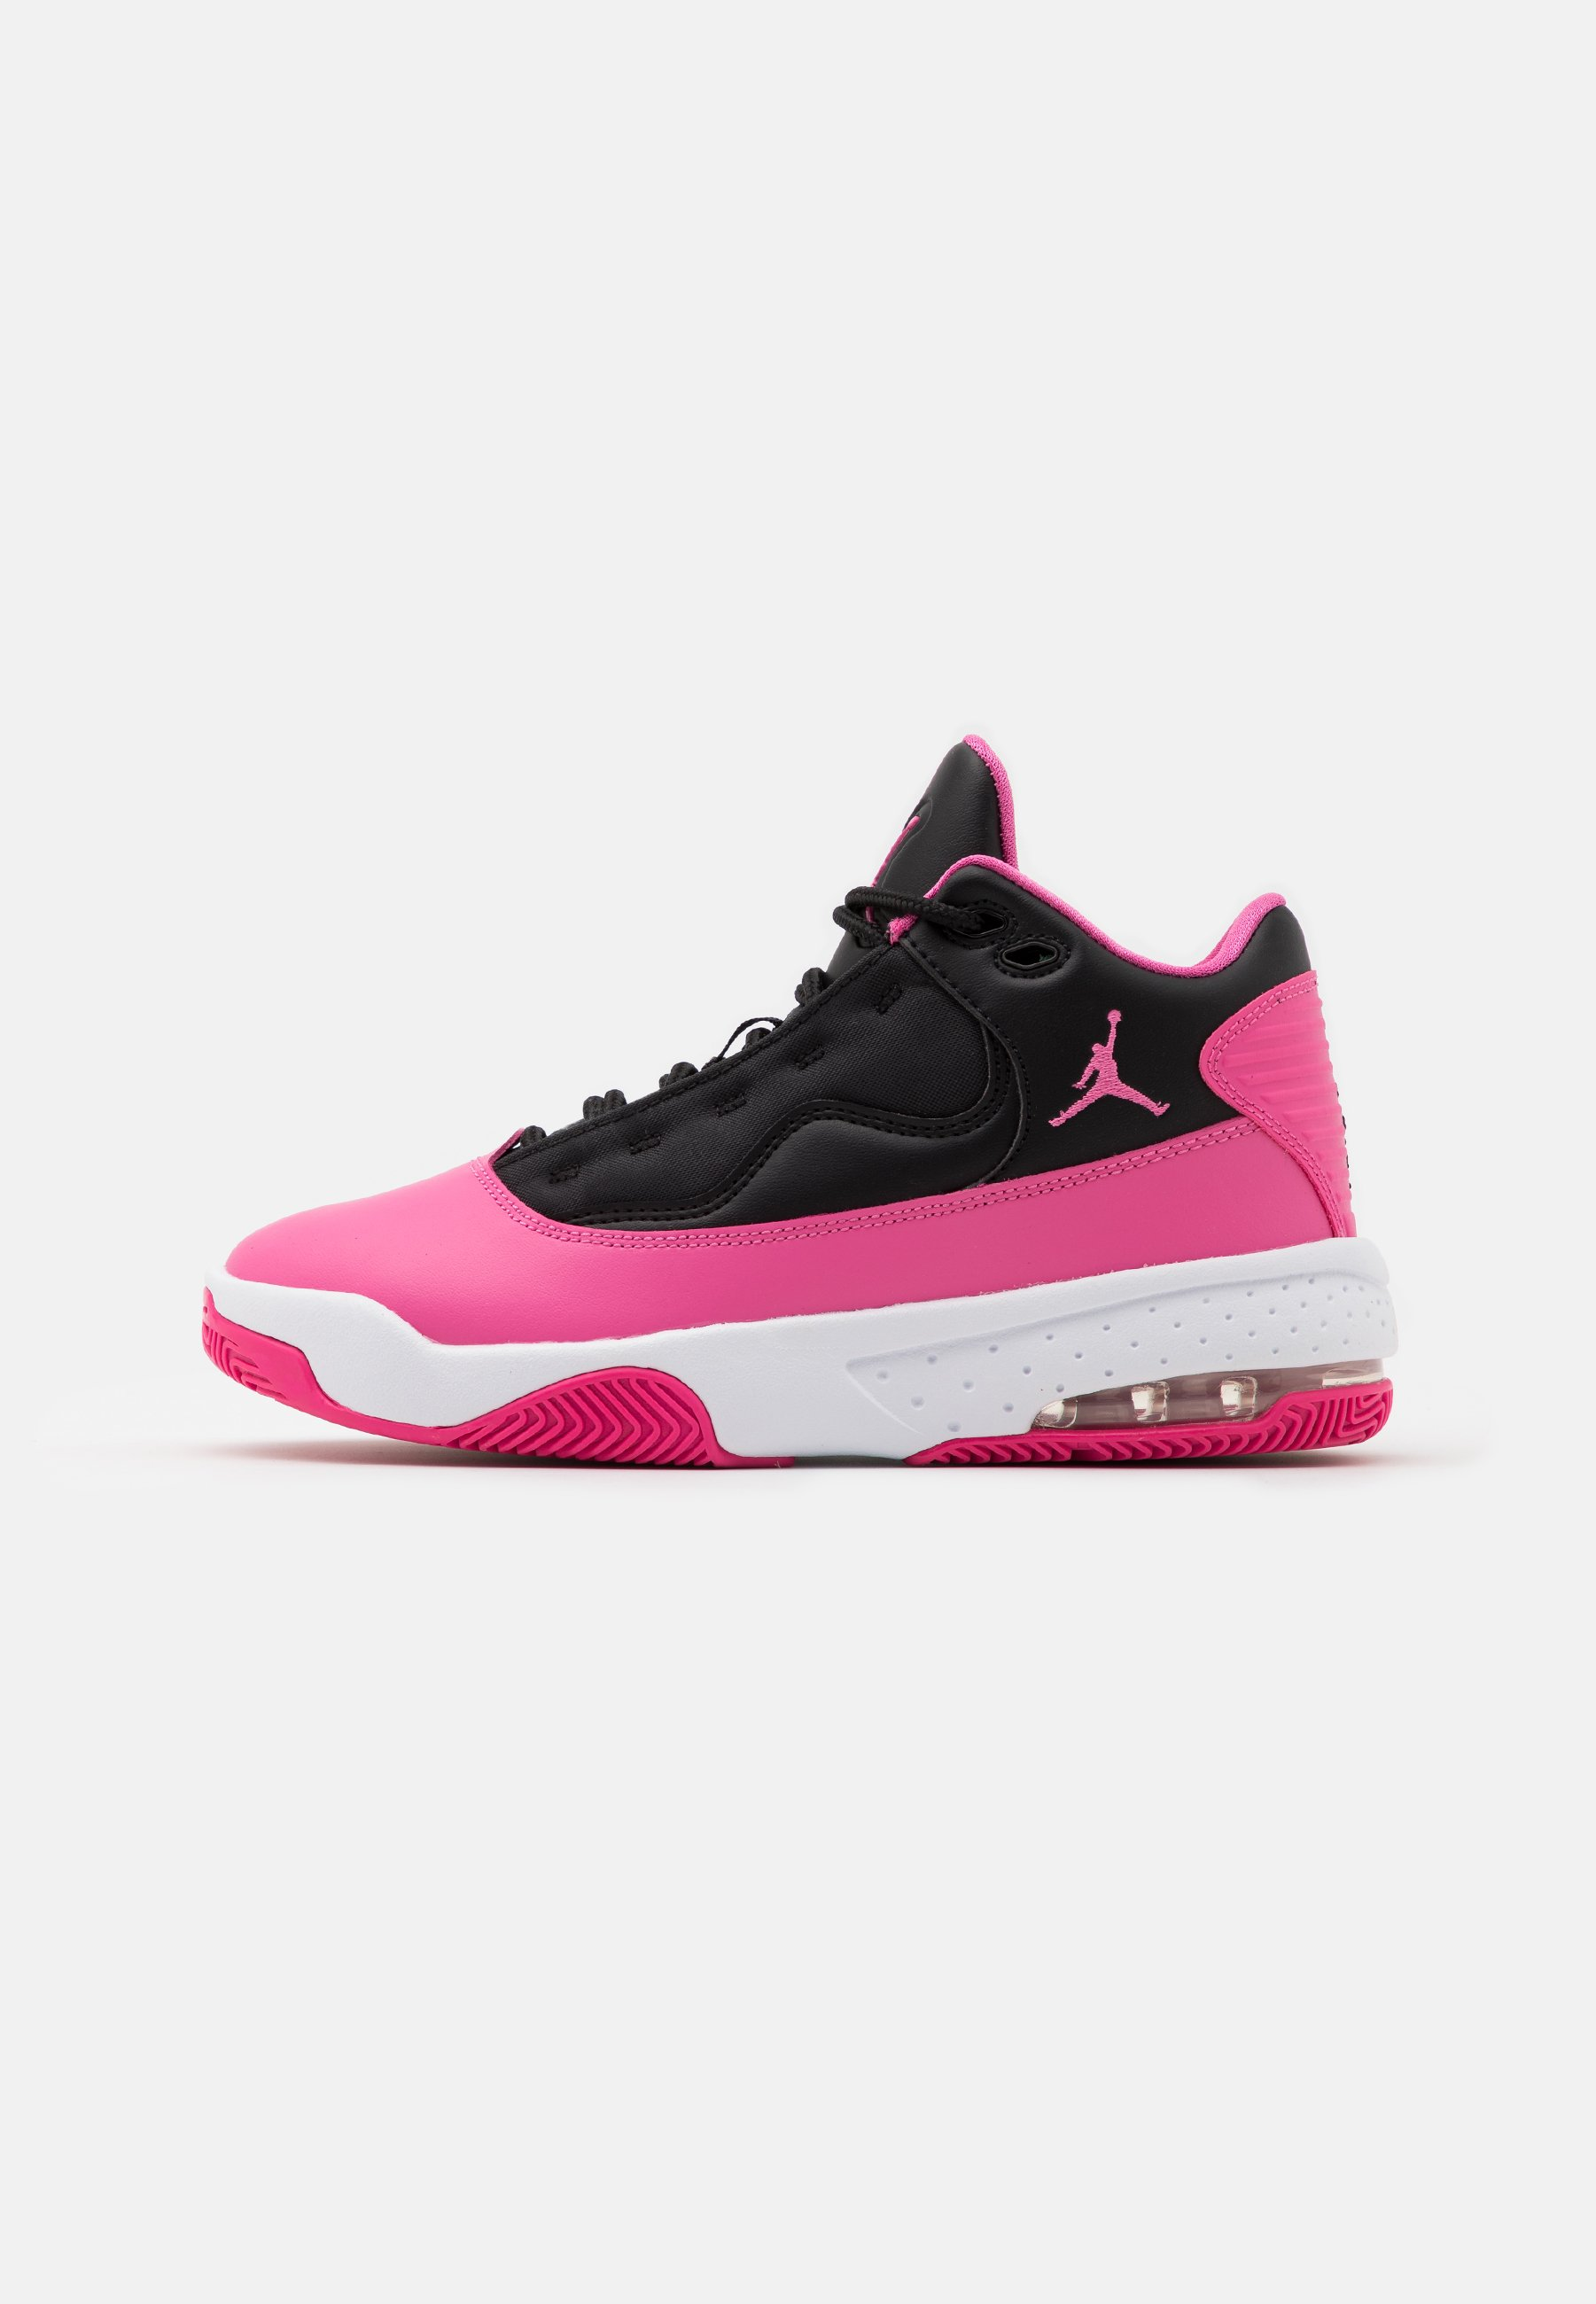 Jordan MAX AURA 2 UNISEX - Chaussures de basket - black/pinksicle ...